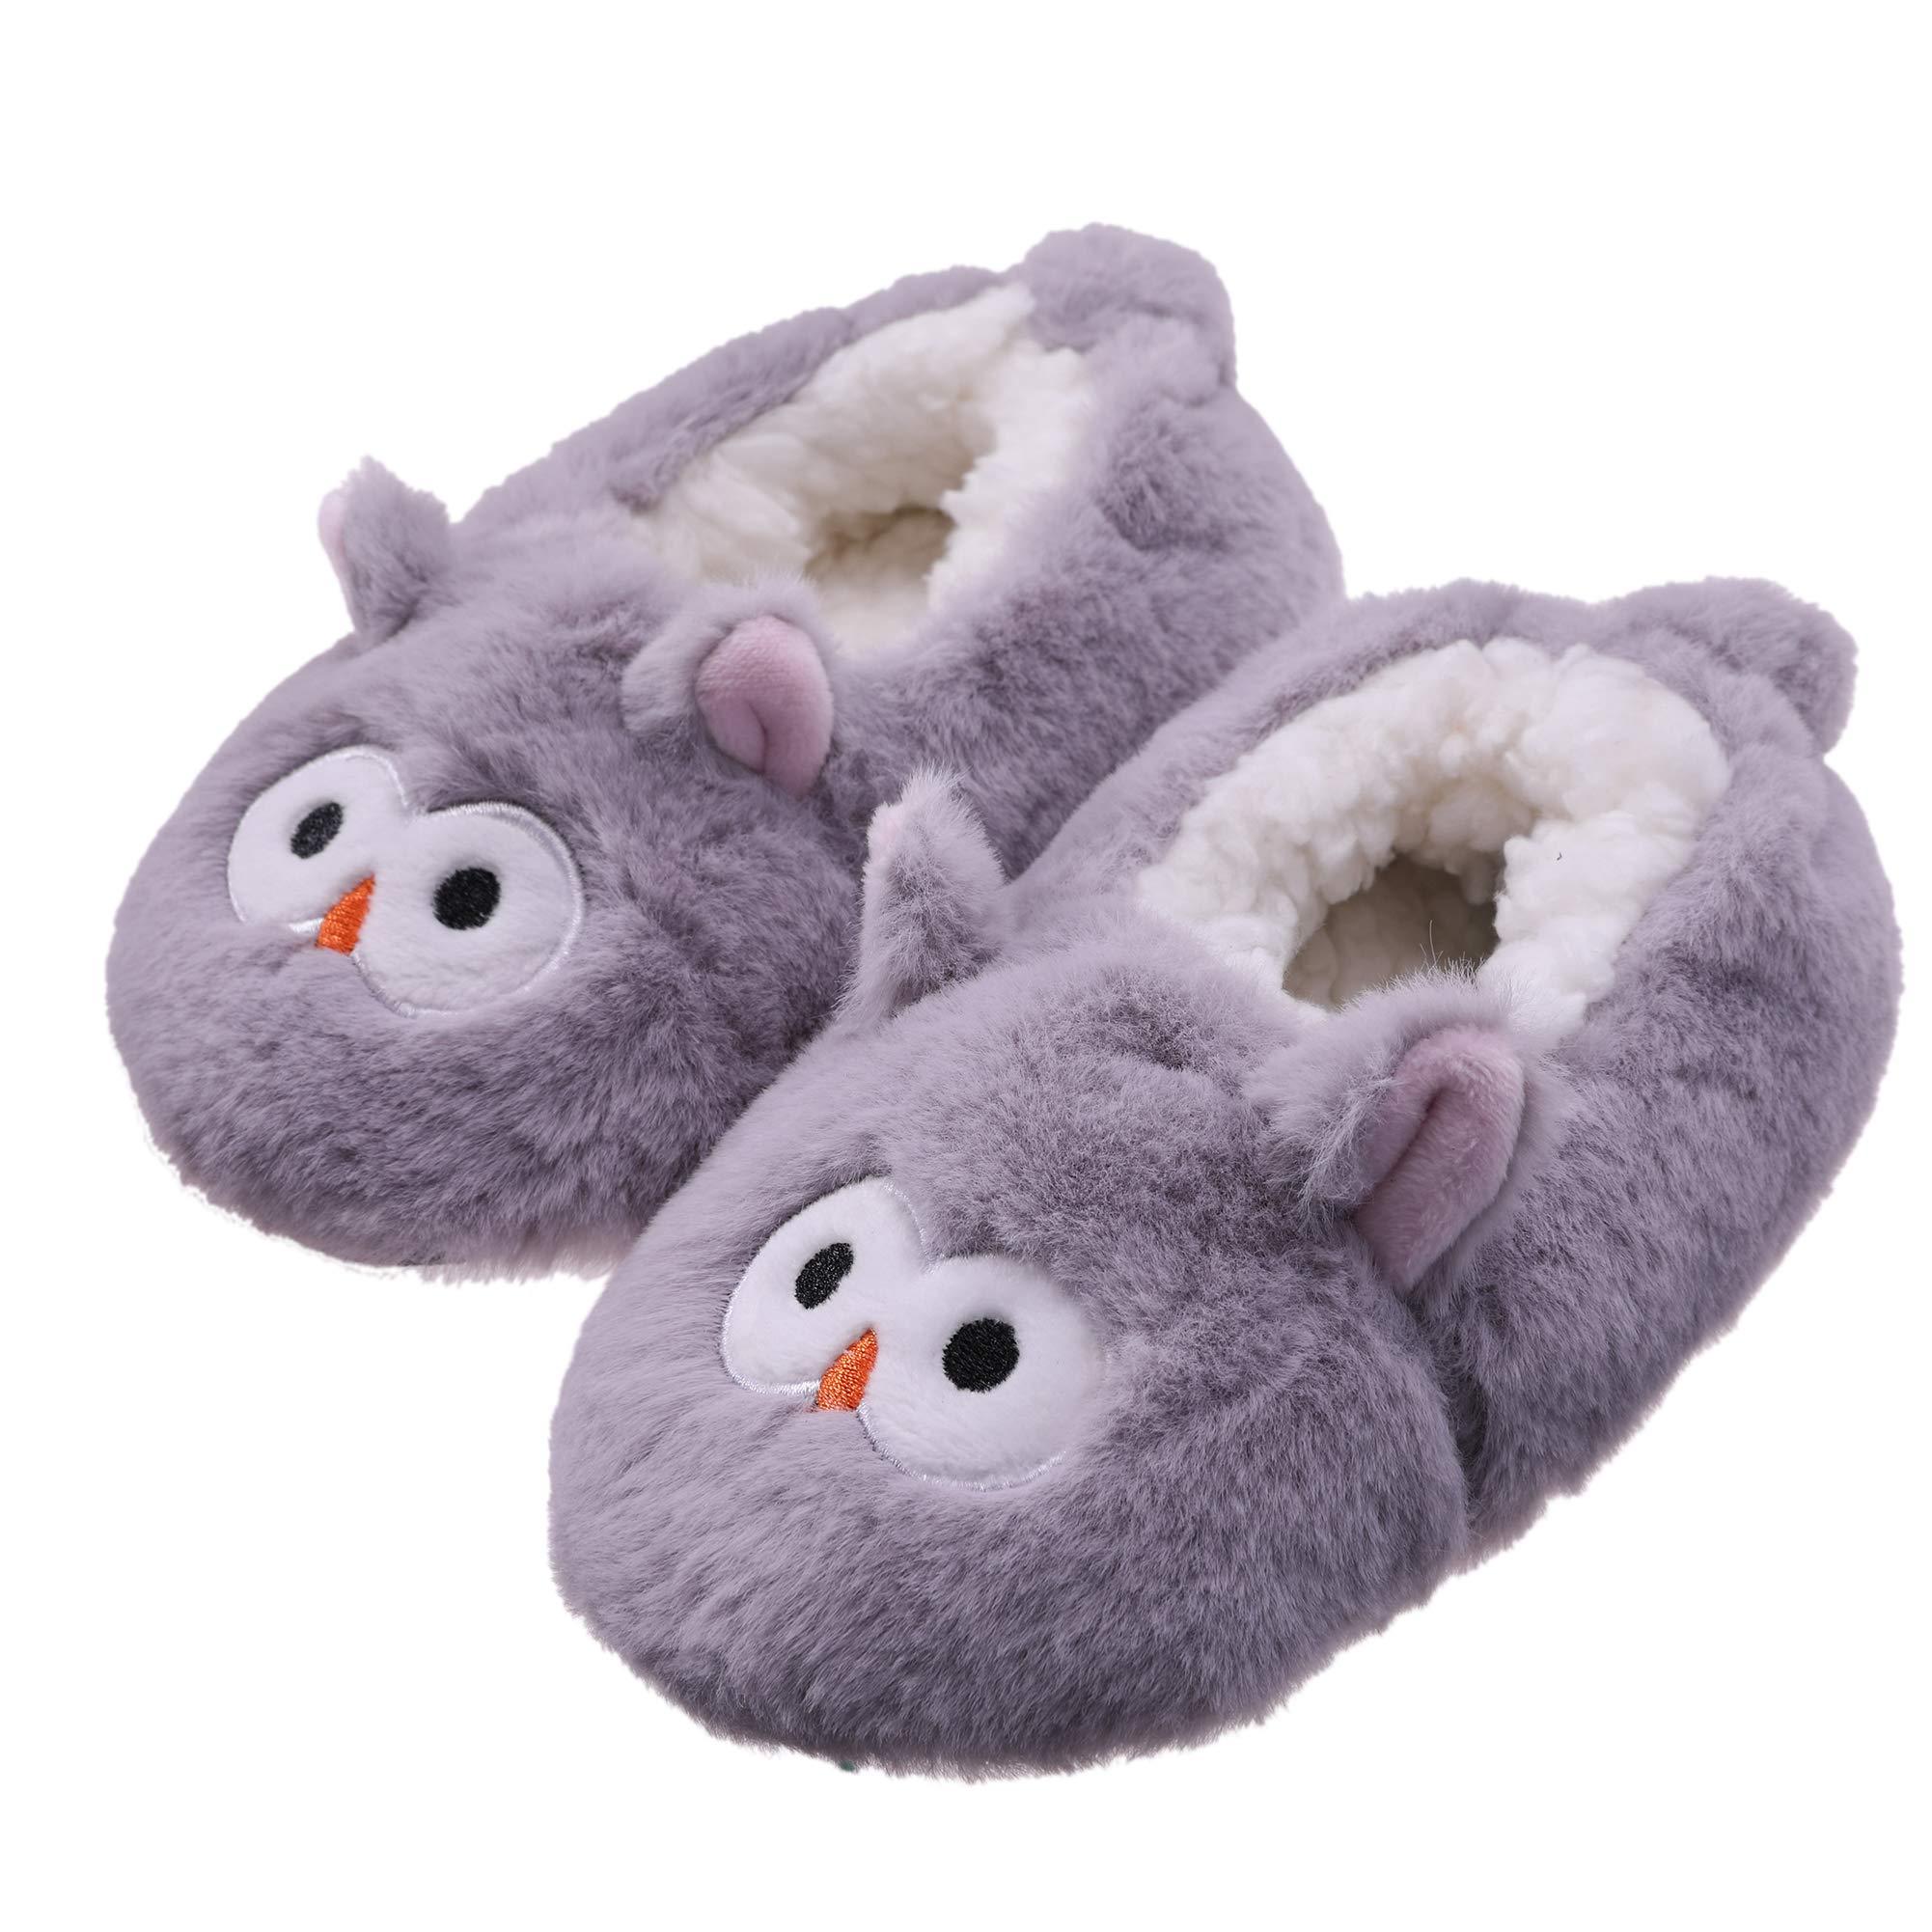 FANZERO 5 Pack Baby Toddlers Girls Boys Anti Grip Fuzzy Slipper Socks Cute Animal Super Soft Warm Winter Floor Socks